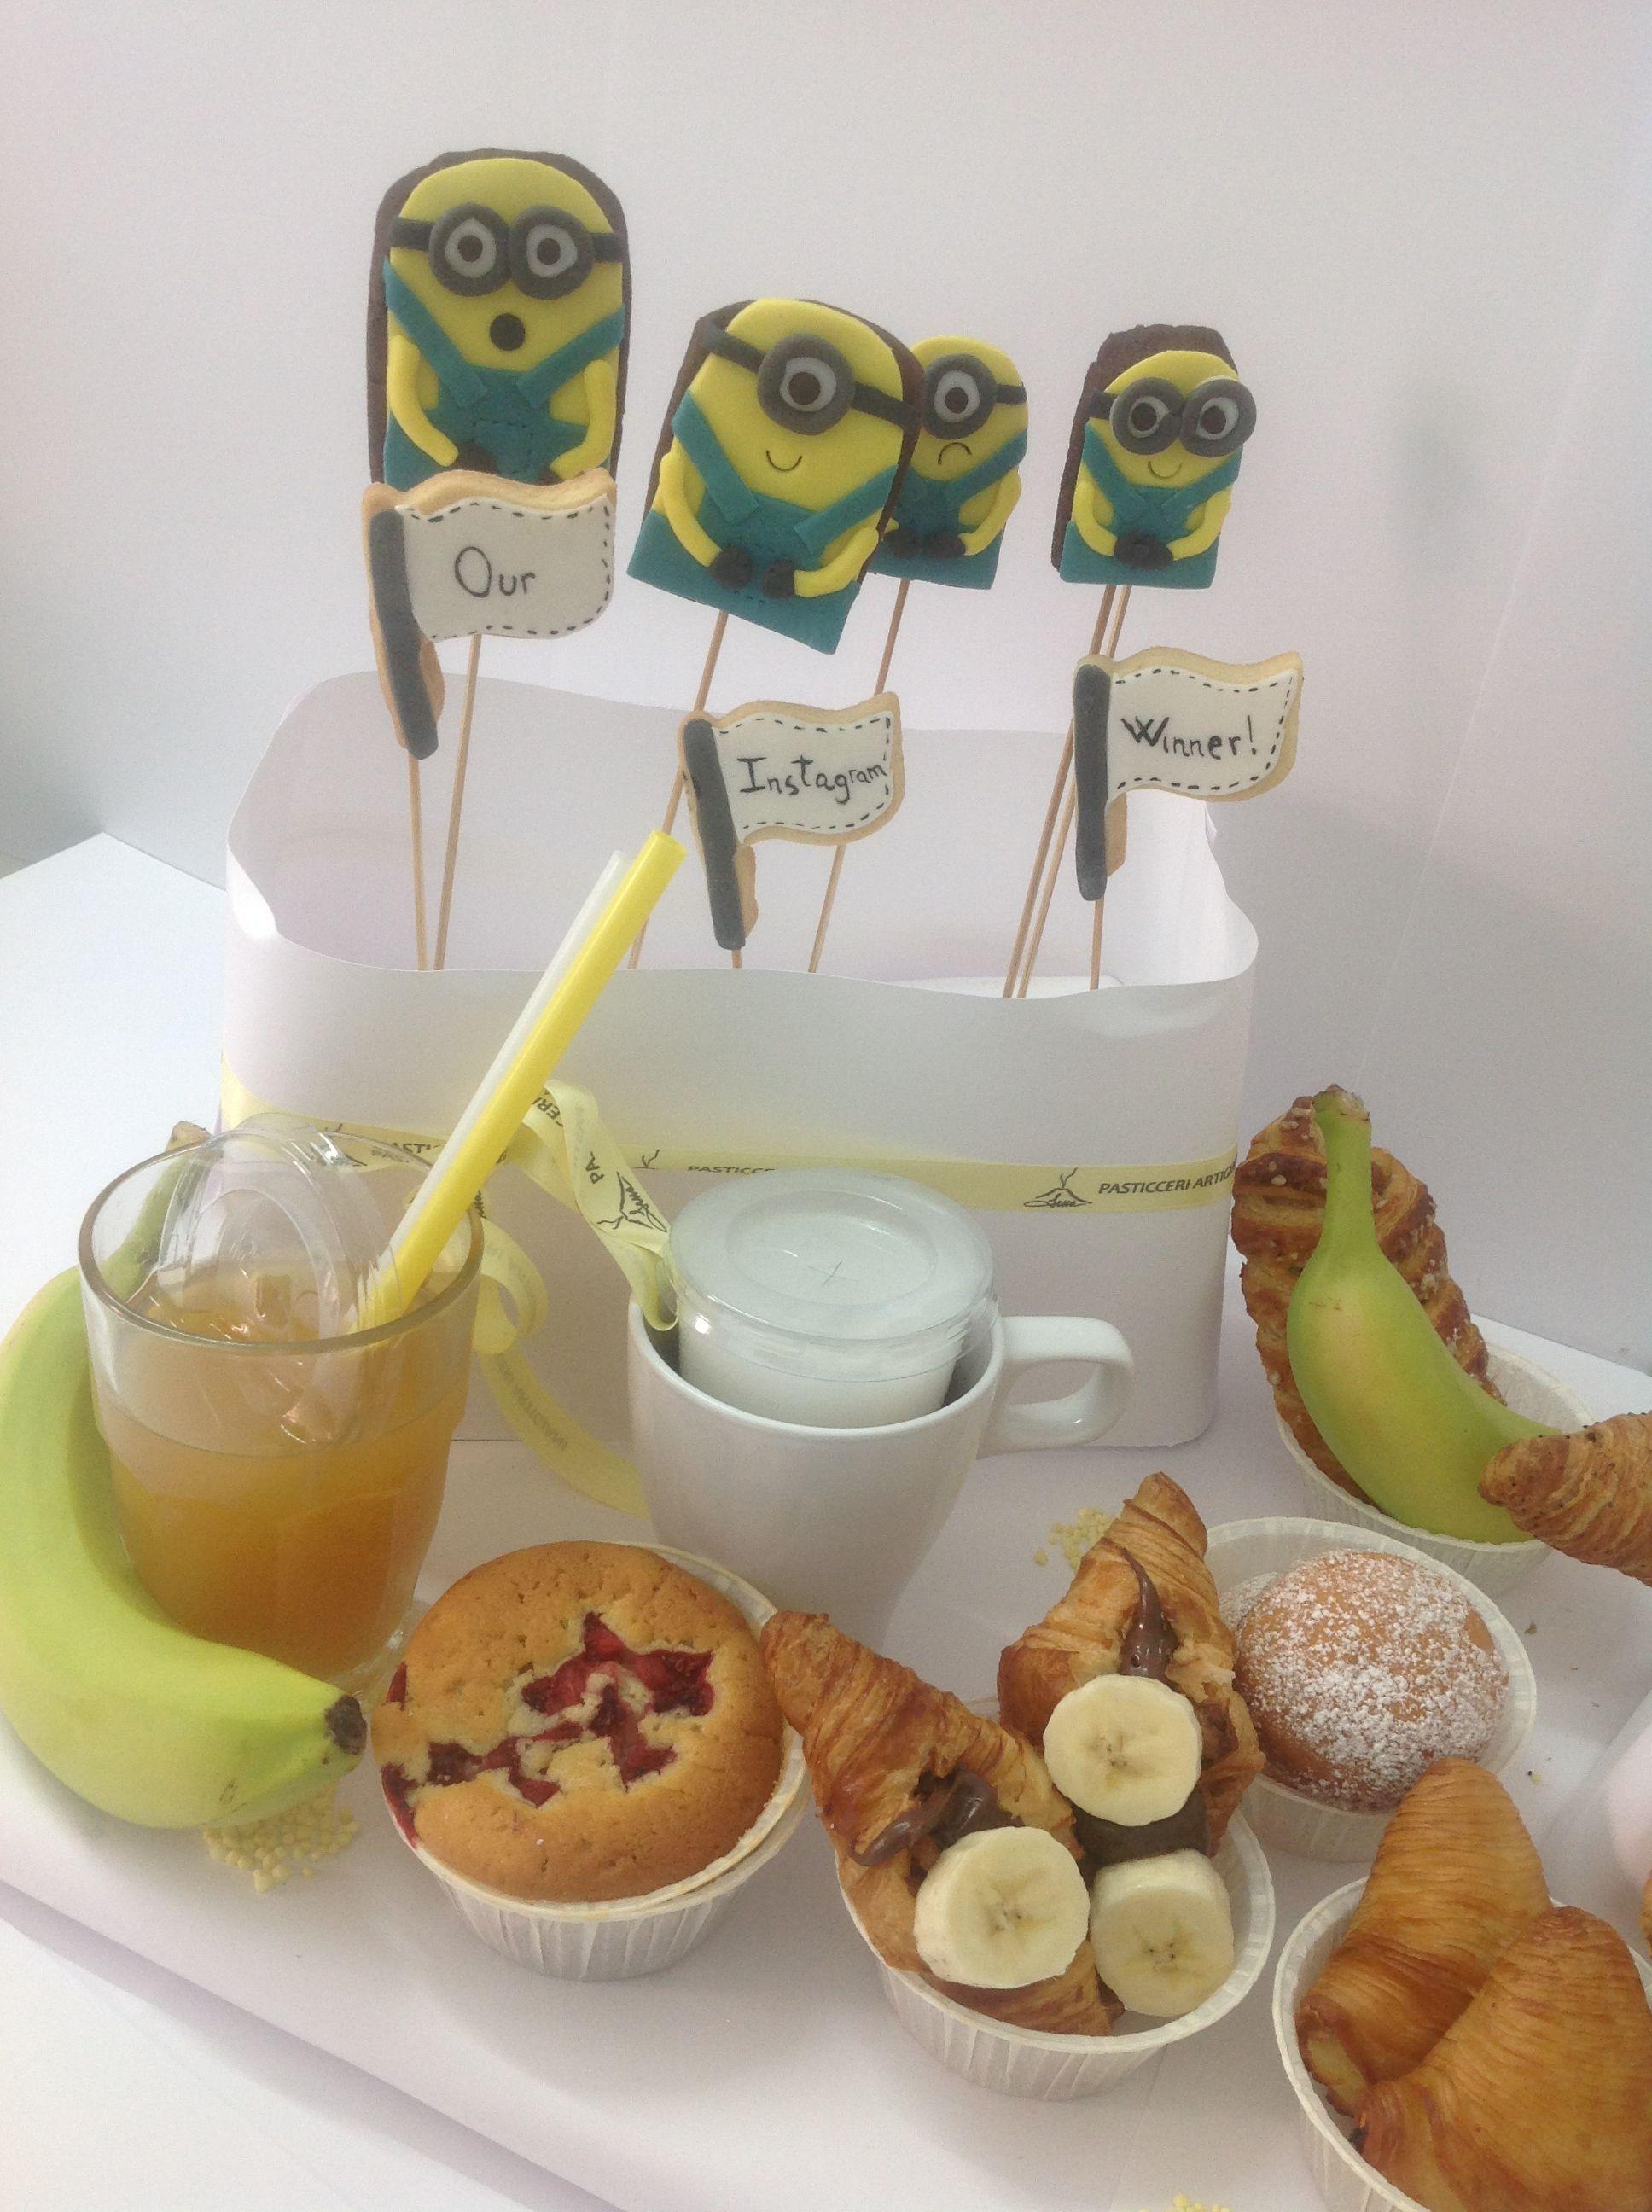 #mignonBreakfast#mignon#brakfastTable#banana#icedCookies#muffin#croissants#SessaspecialEventAndCakes#SessaartigianiDelGusto